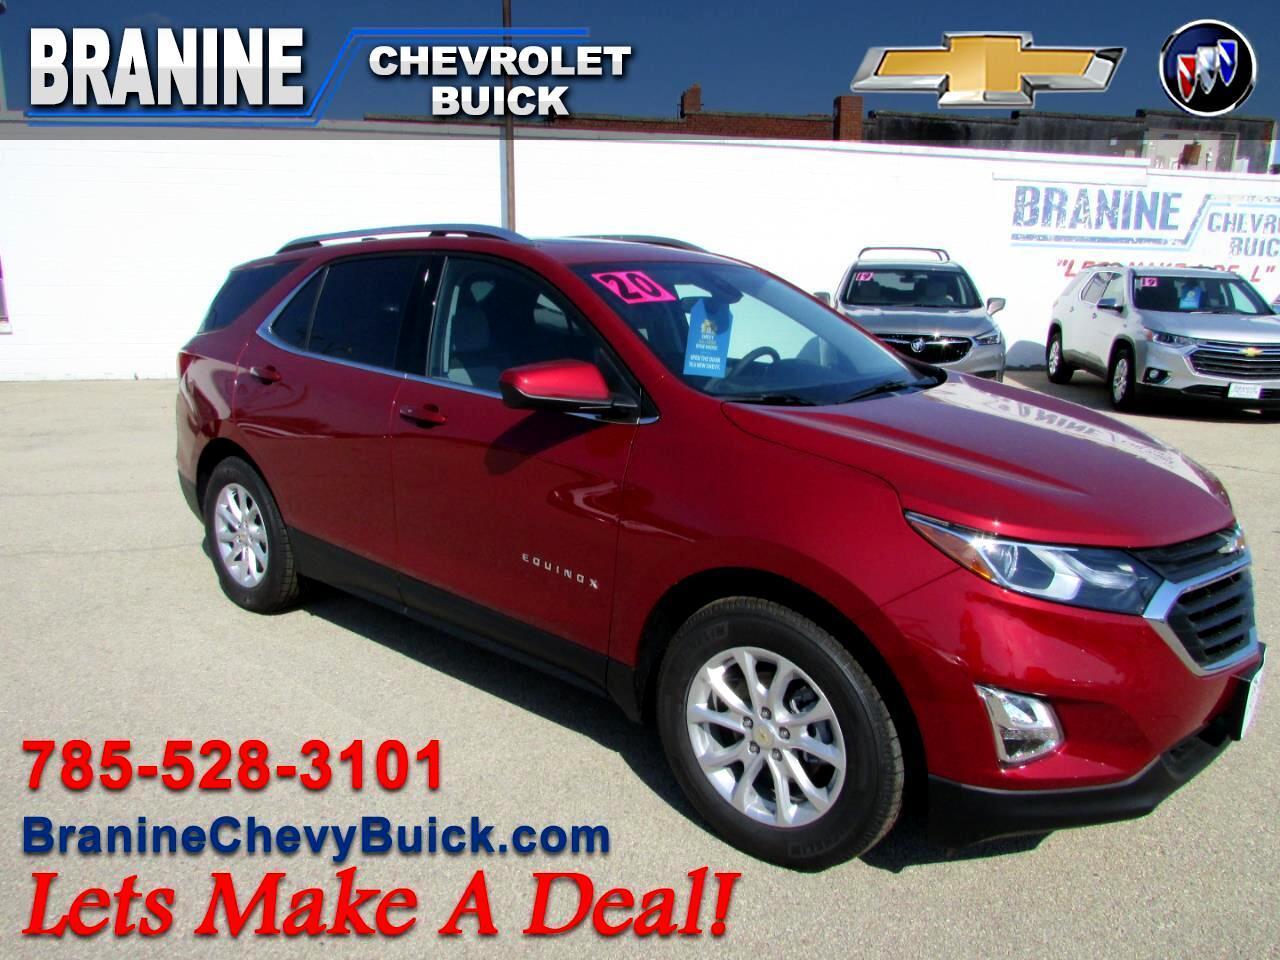 2020 Chevrolet Equinox FWD 4dr LT w/1LT